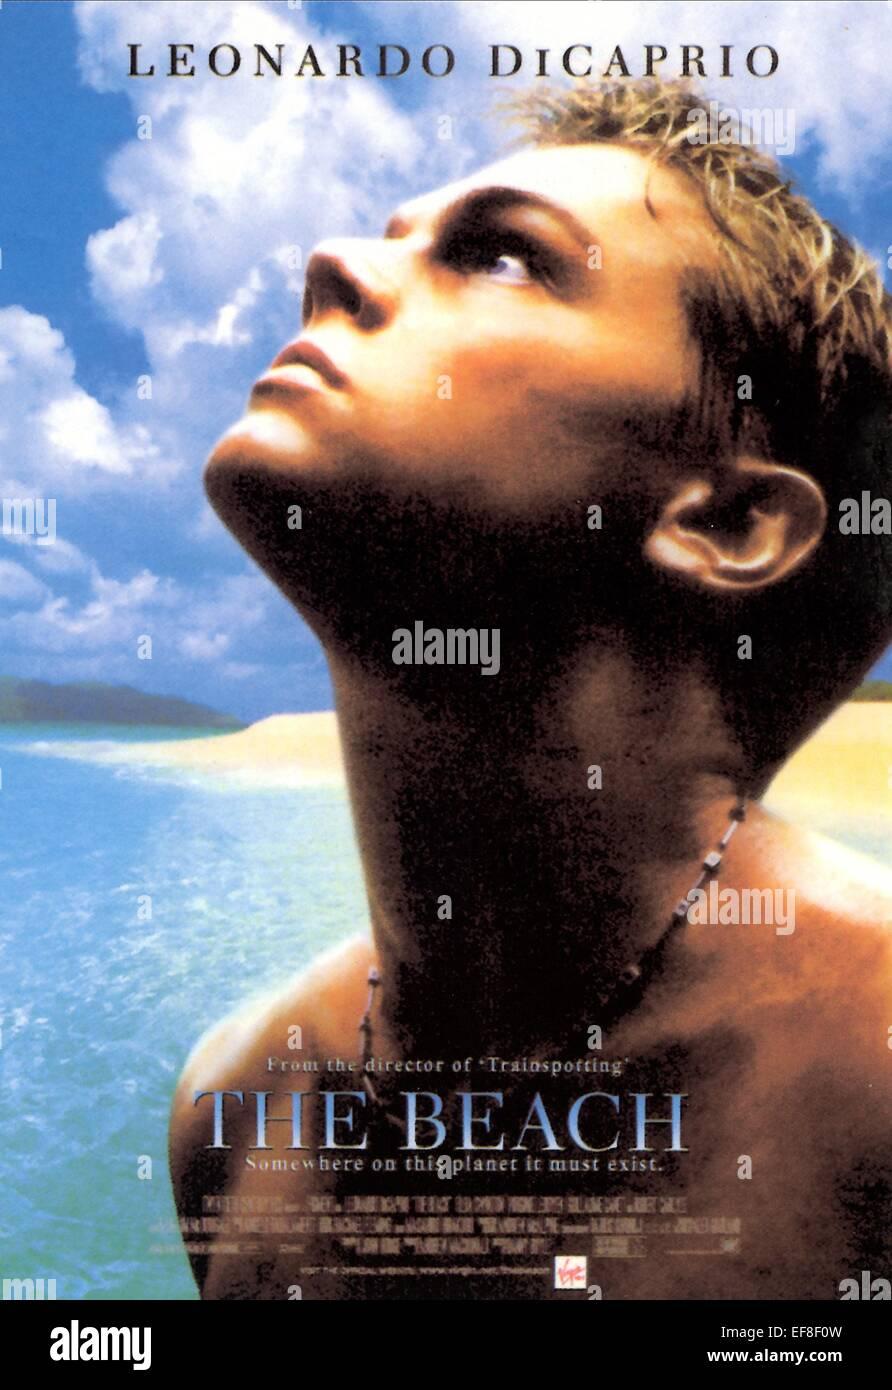 leonardo dicaprio poster the beach 2000 stock photo